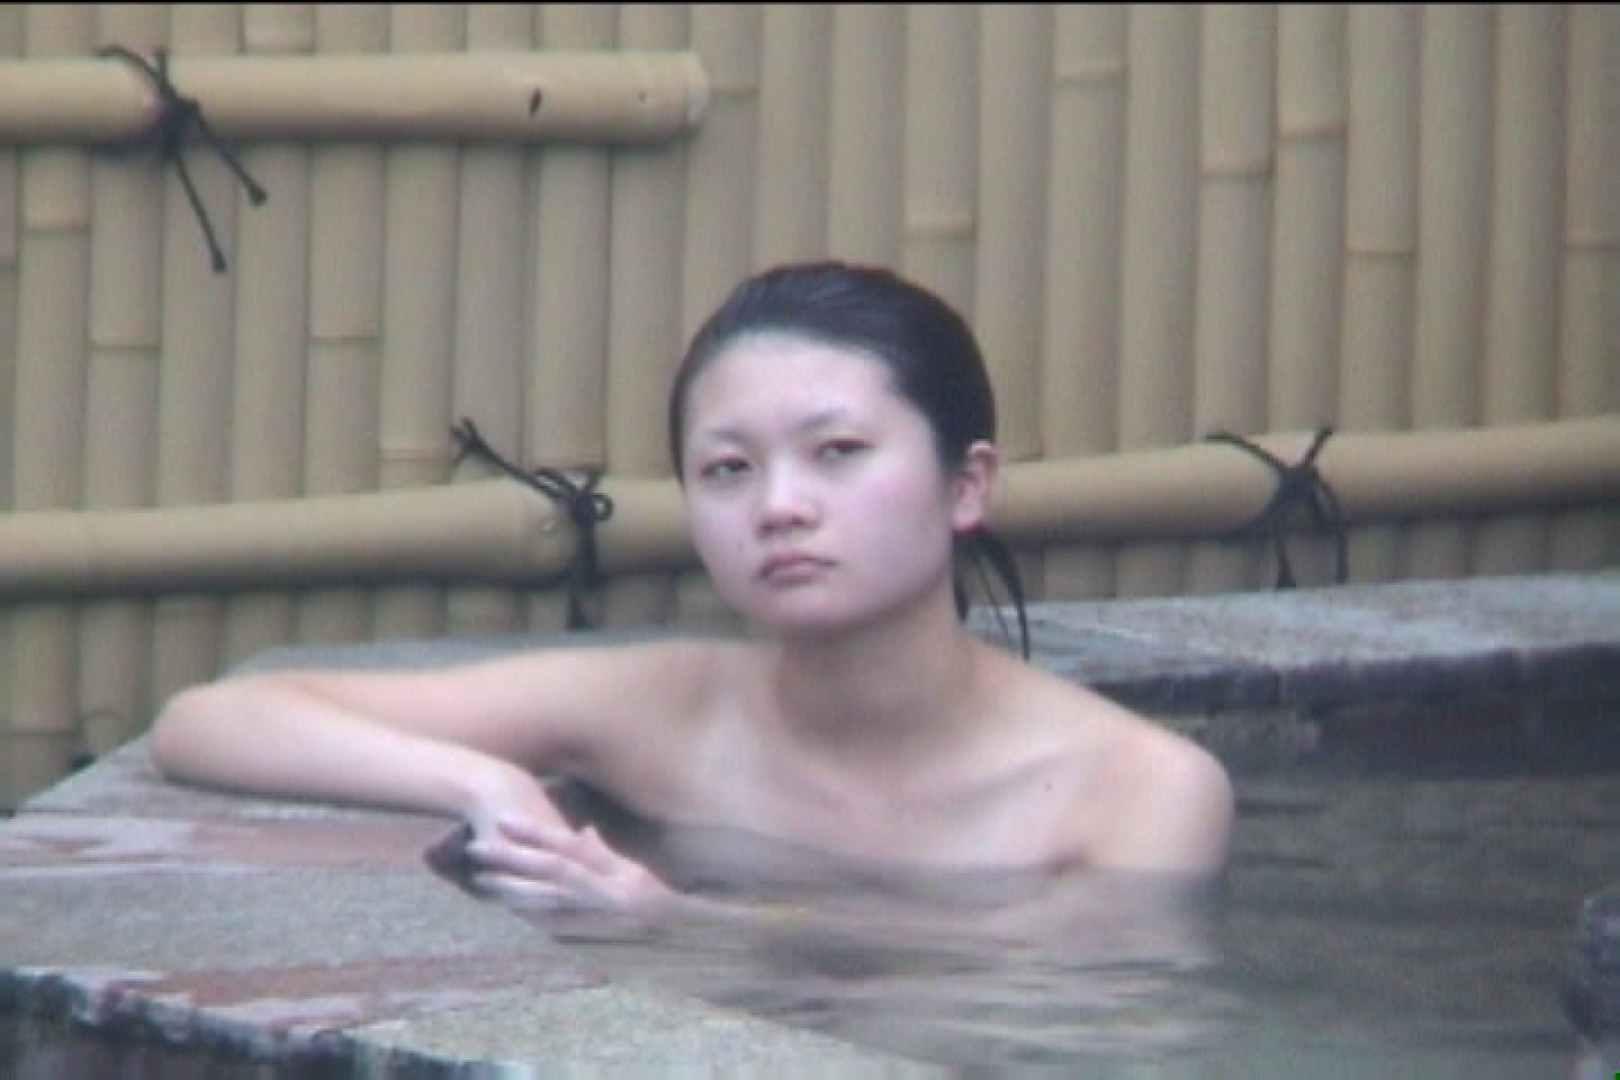 Aquaな露天風呂Vol.97【VIP限定】 OLのプライベート  11pic 9